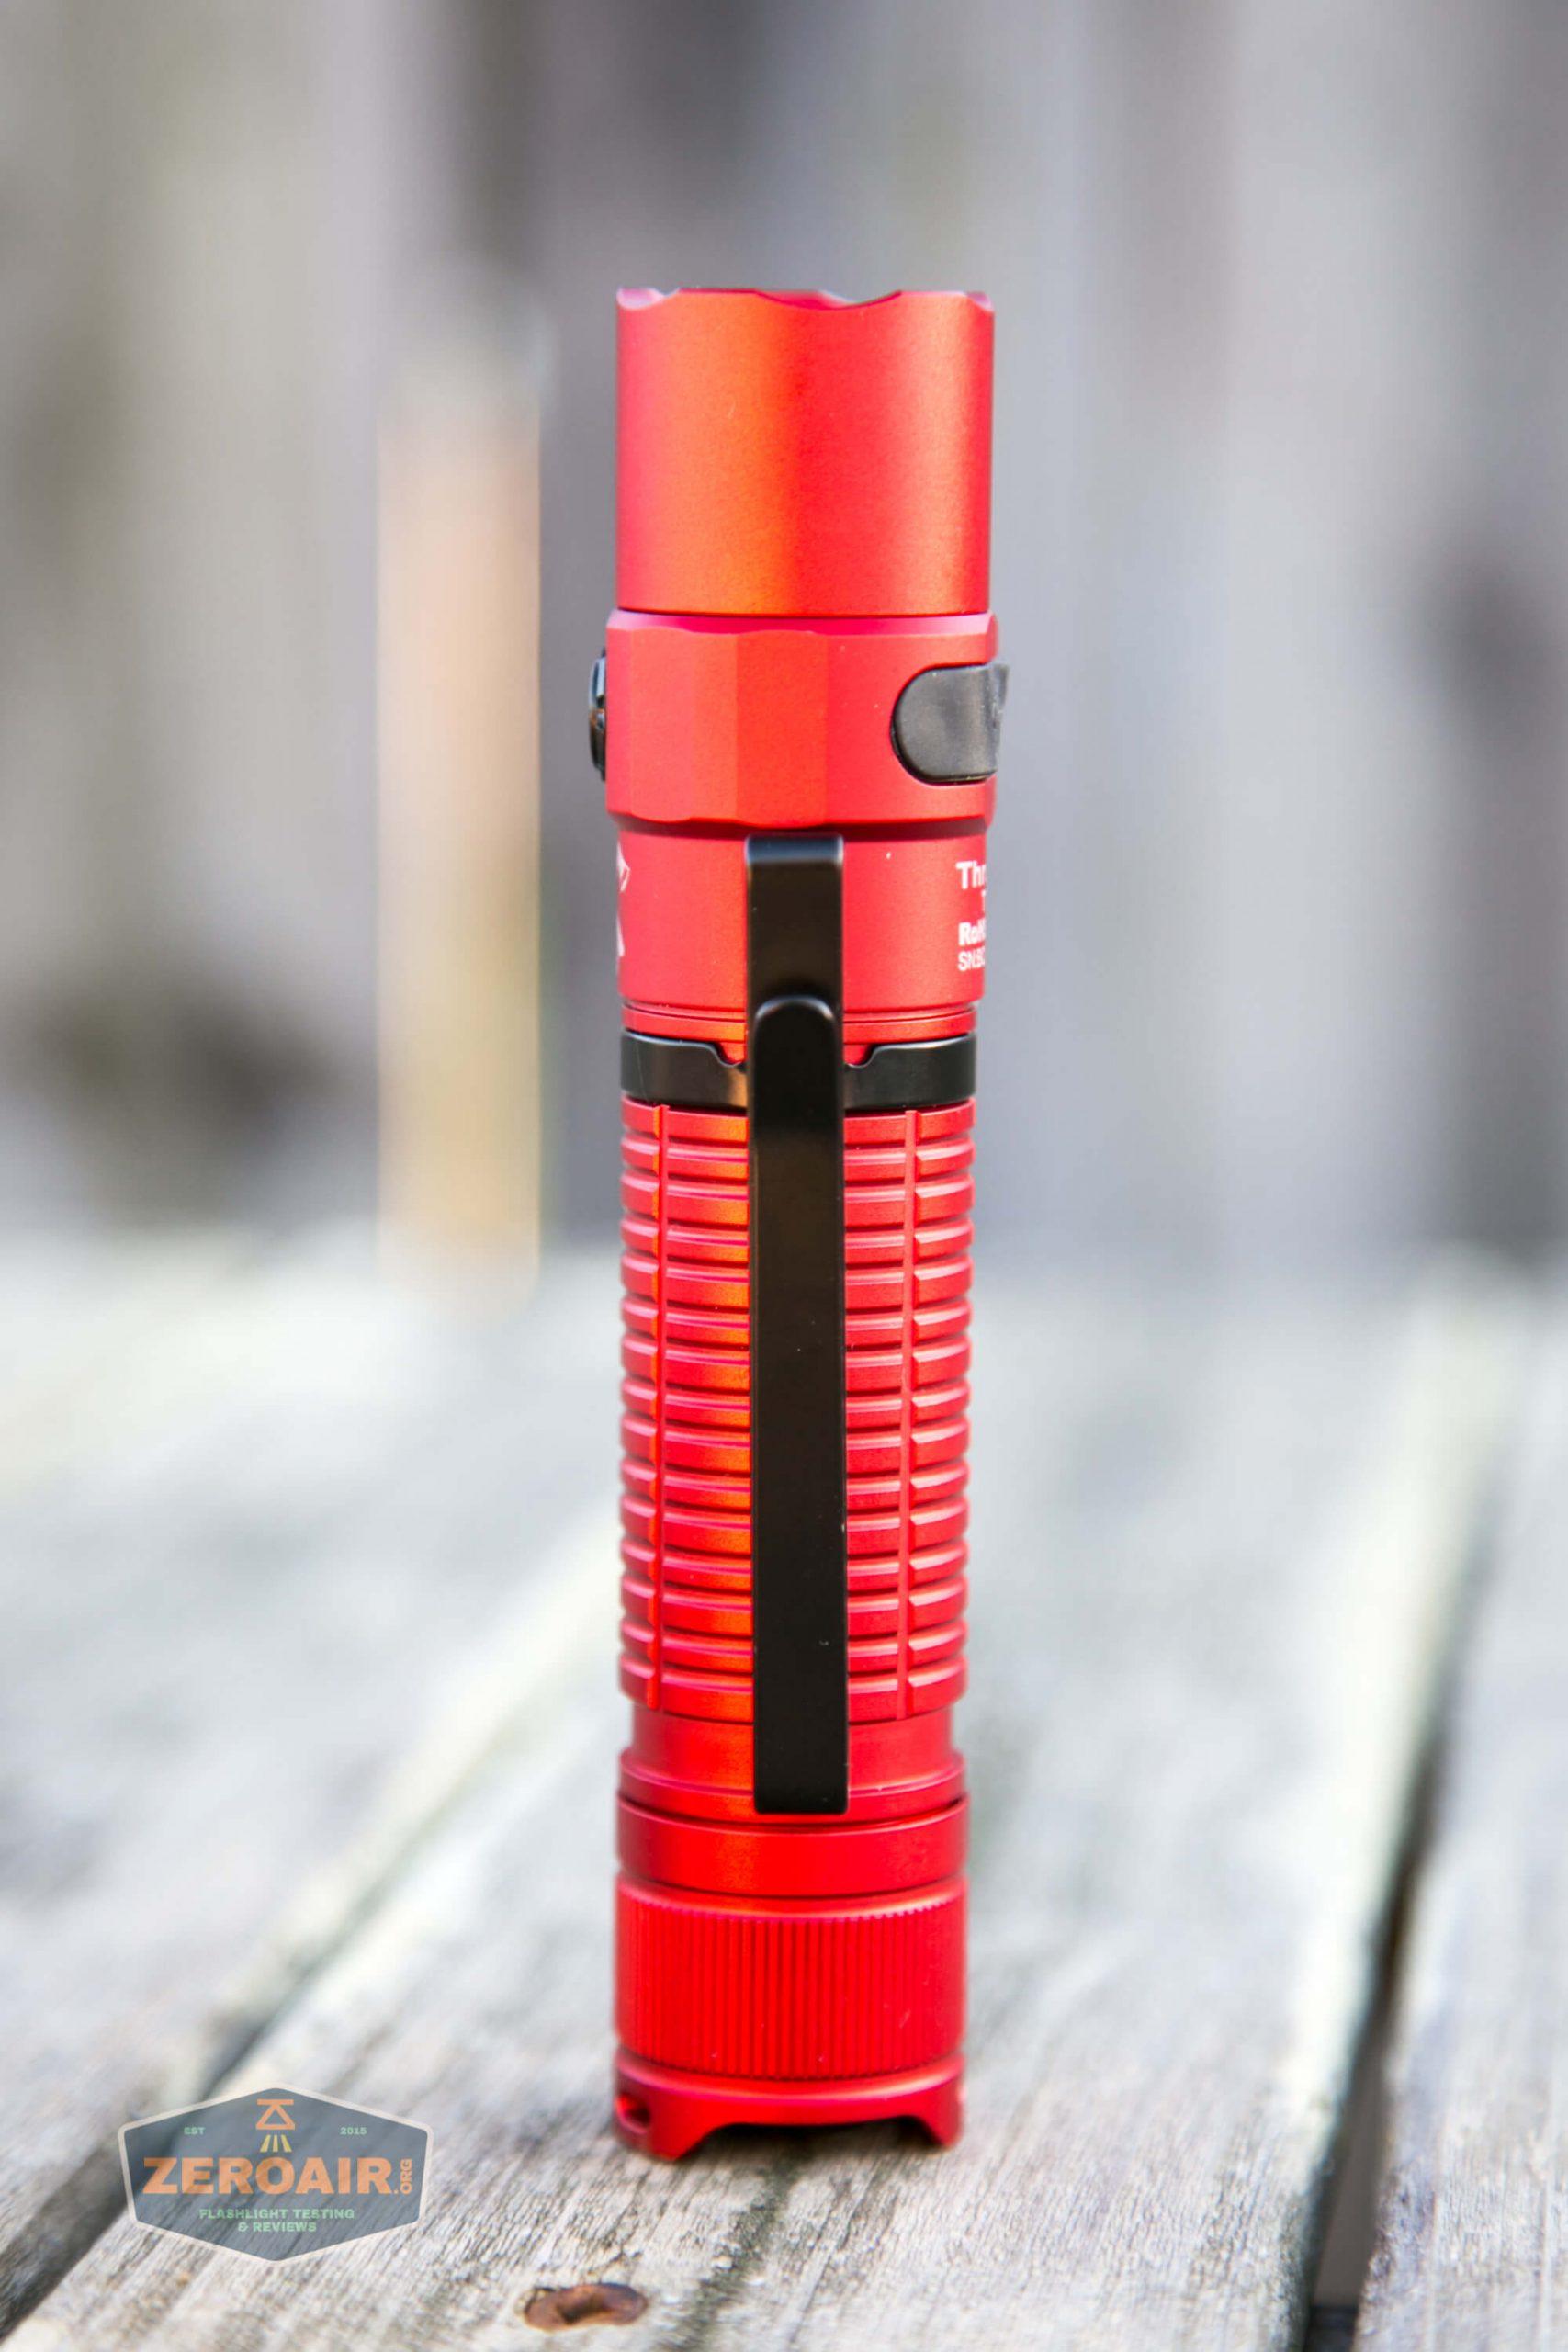 thrunite tt20 the outsider red 21700 flashlight standing